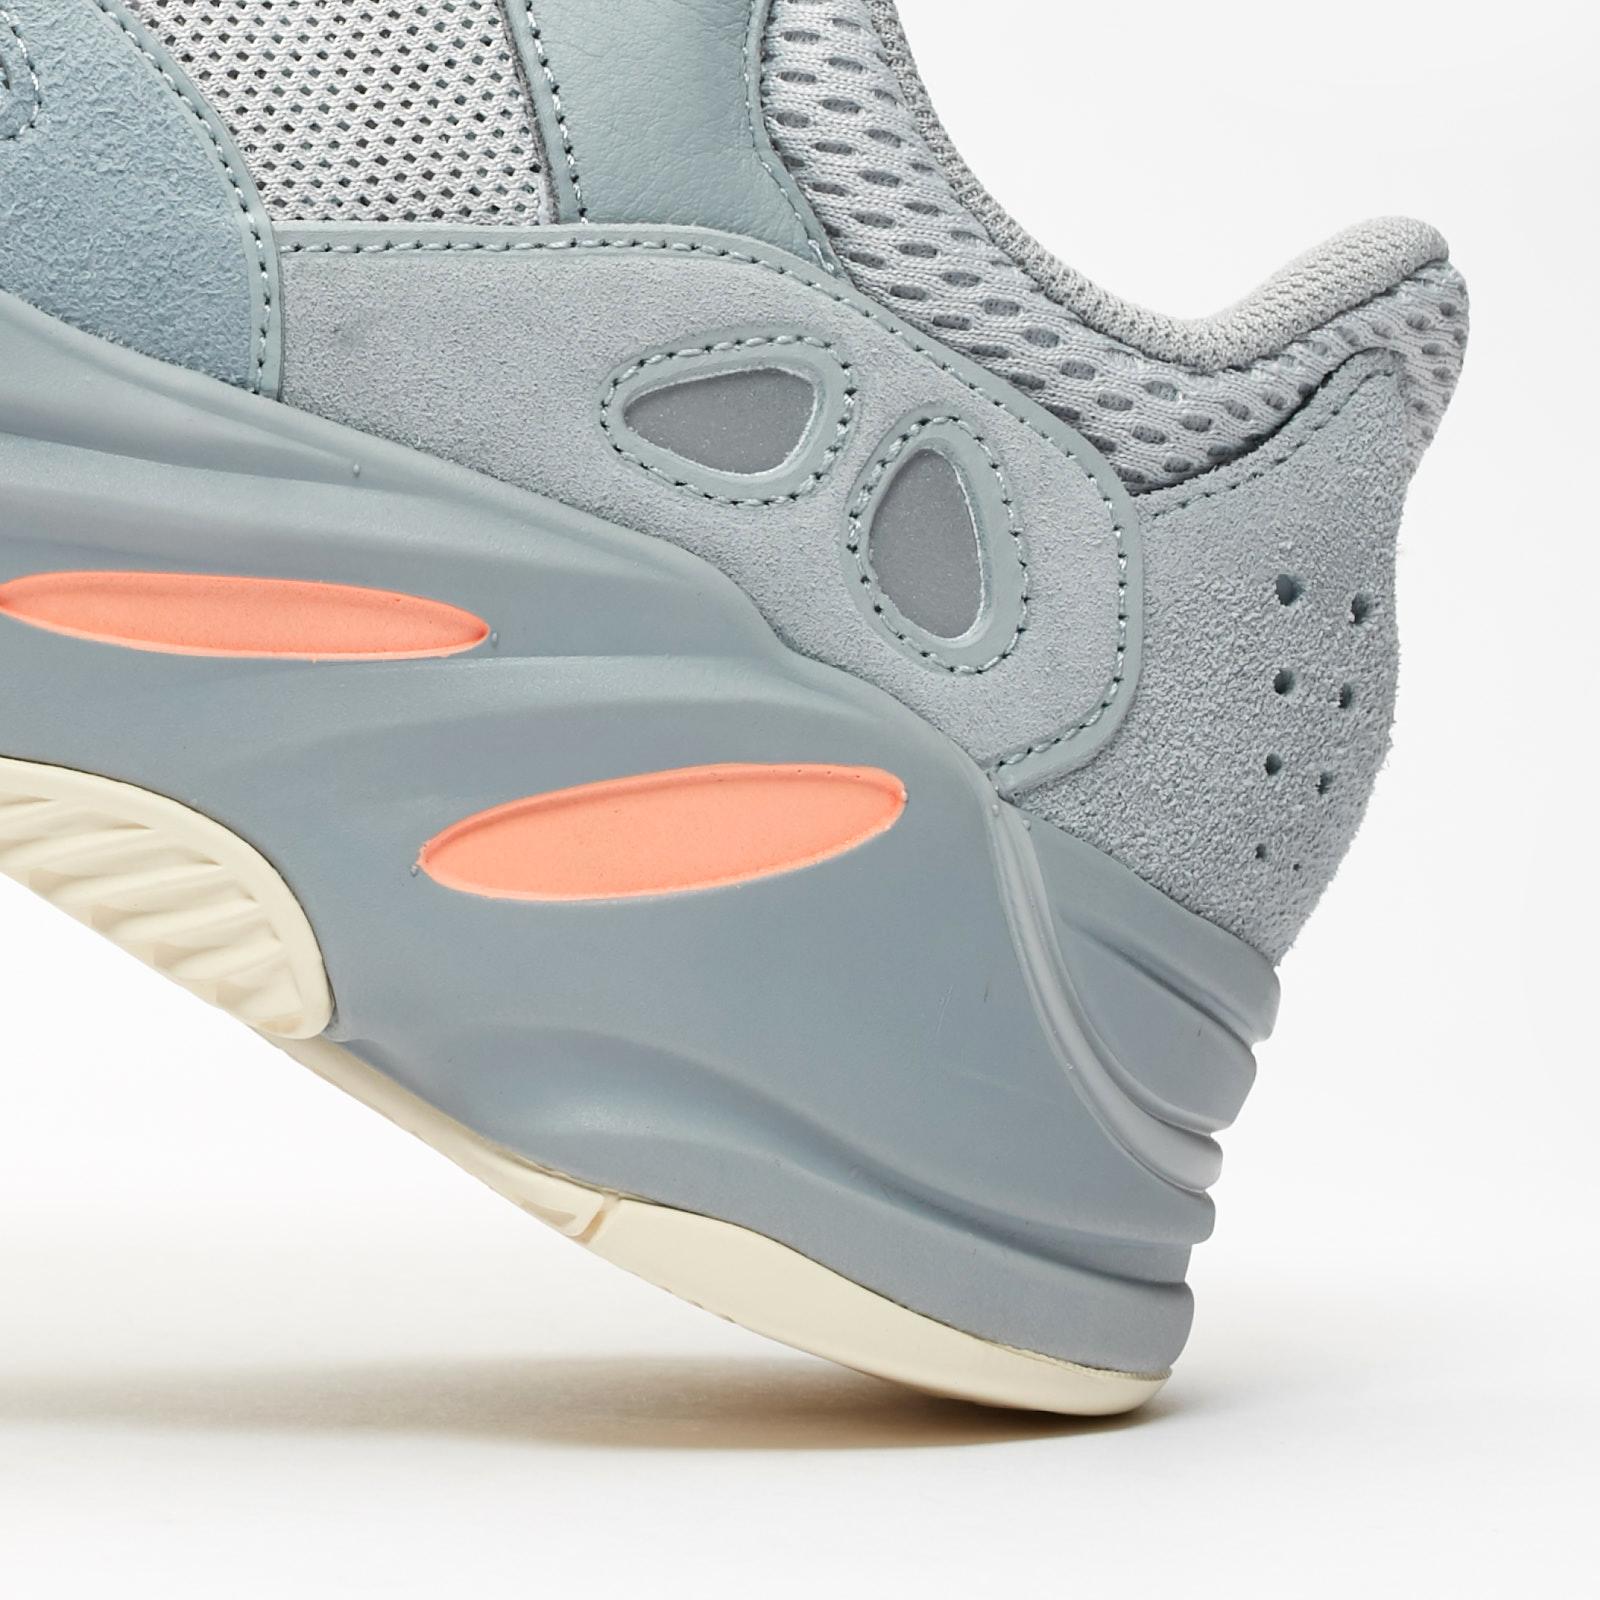 e78fd24c72159 adidas Yeezy Boost 700 - Eg7597 - Sneakersnstuff